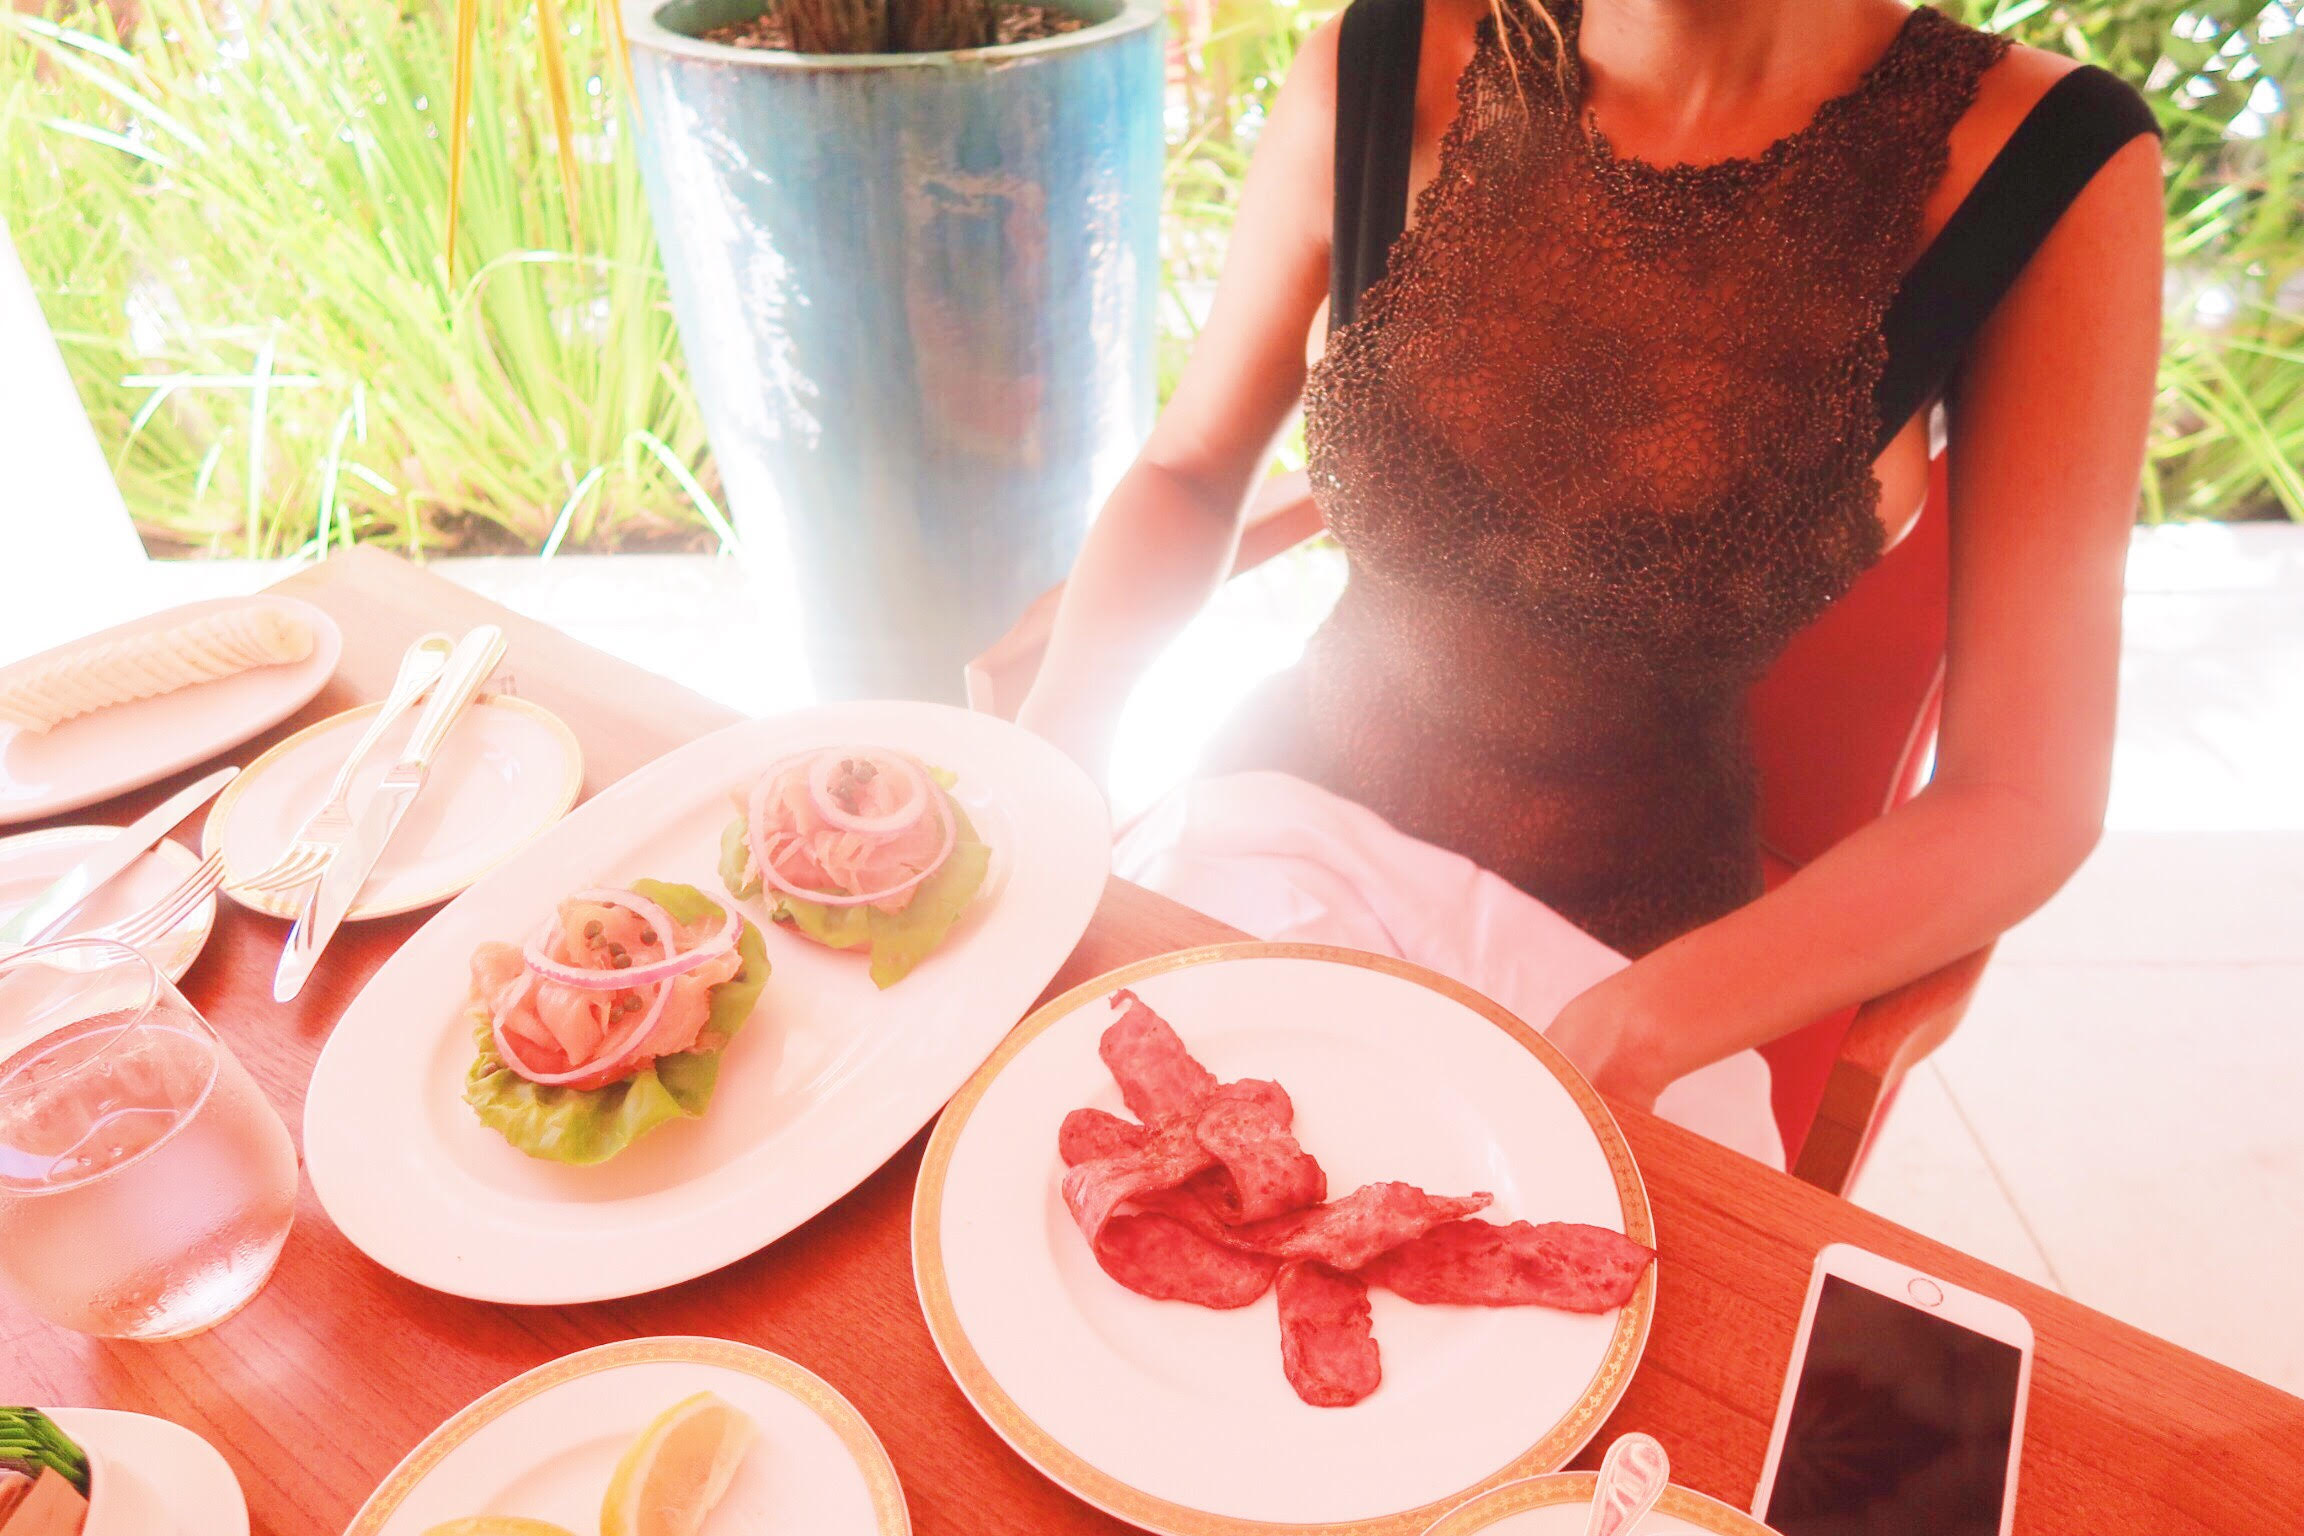 food + turkey bacon + slamon + presentation + food + faena hotel miami beach.jpg